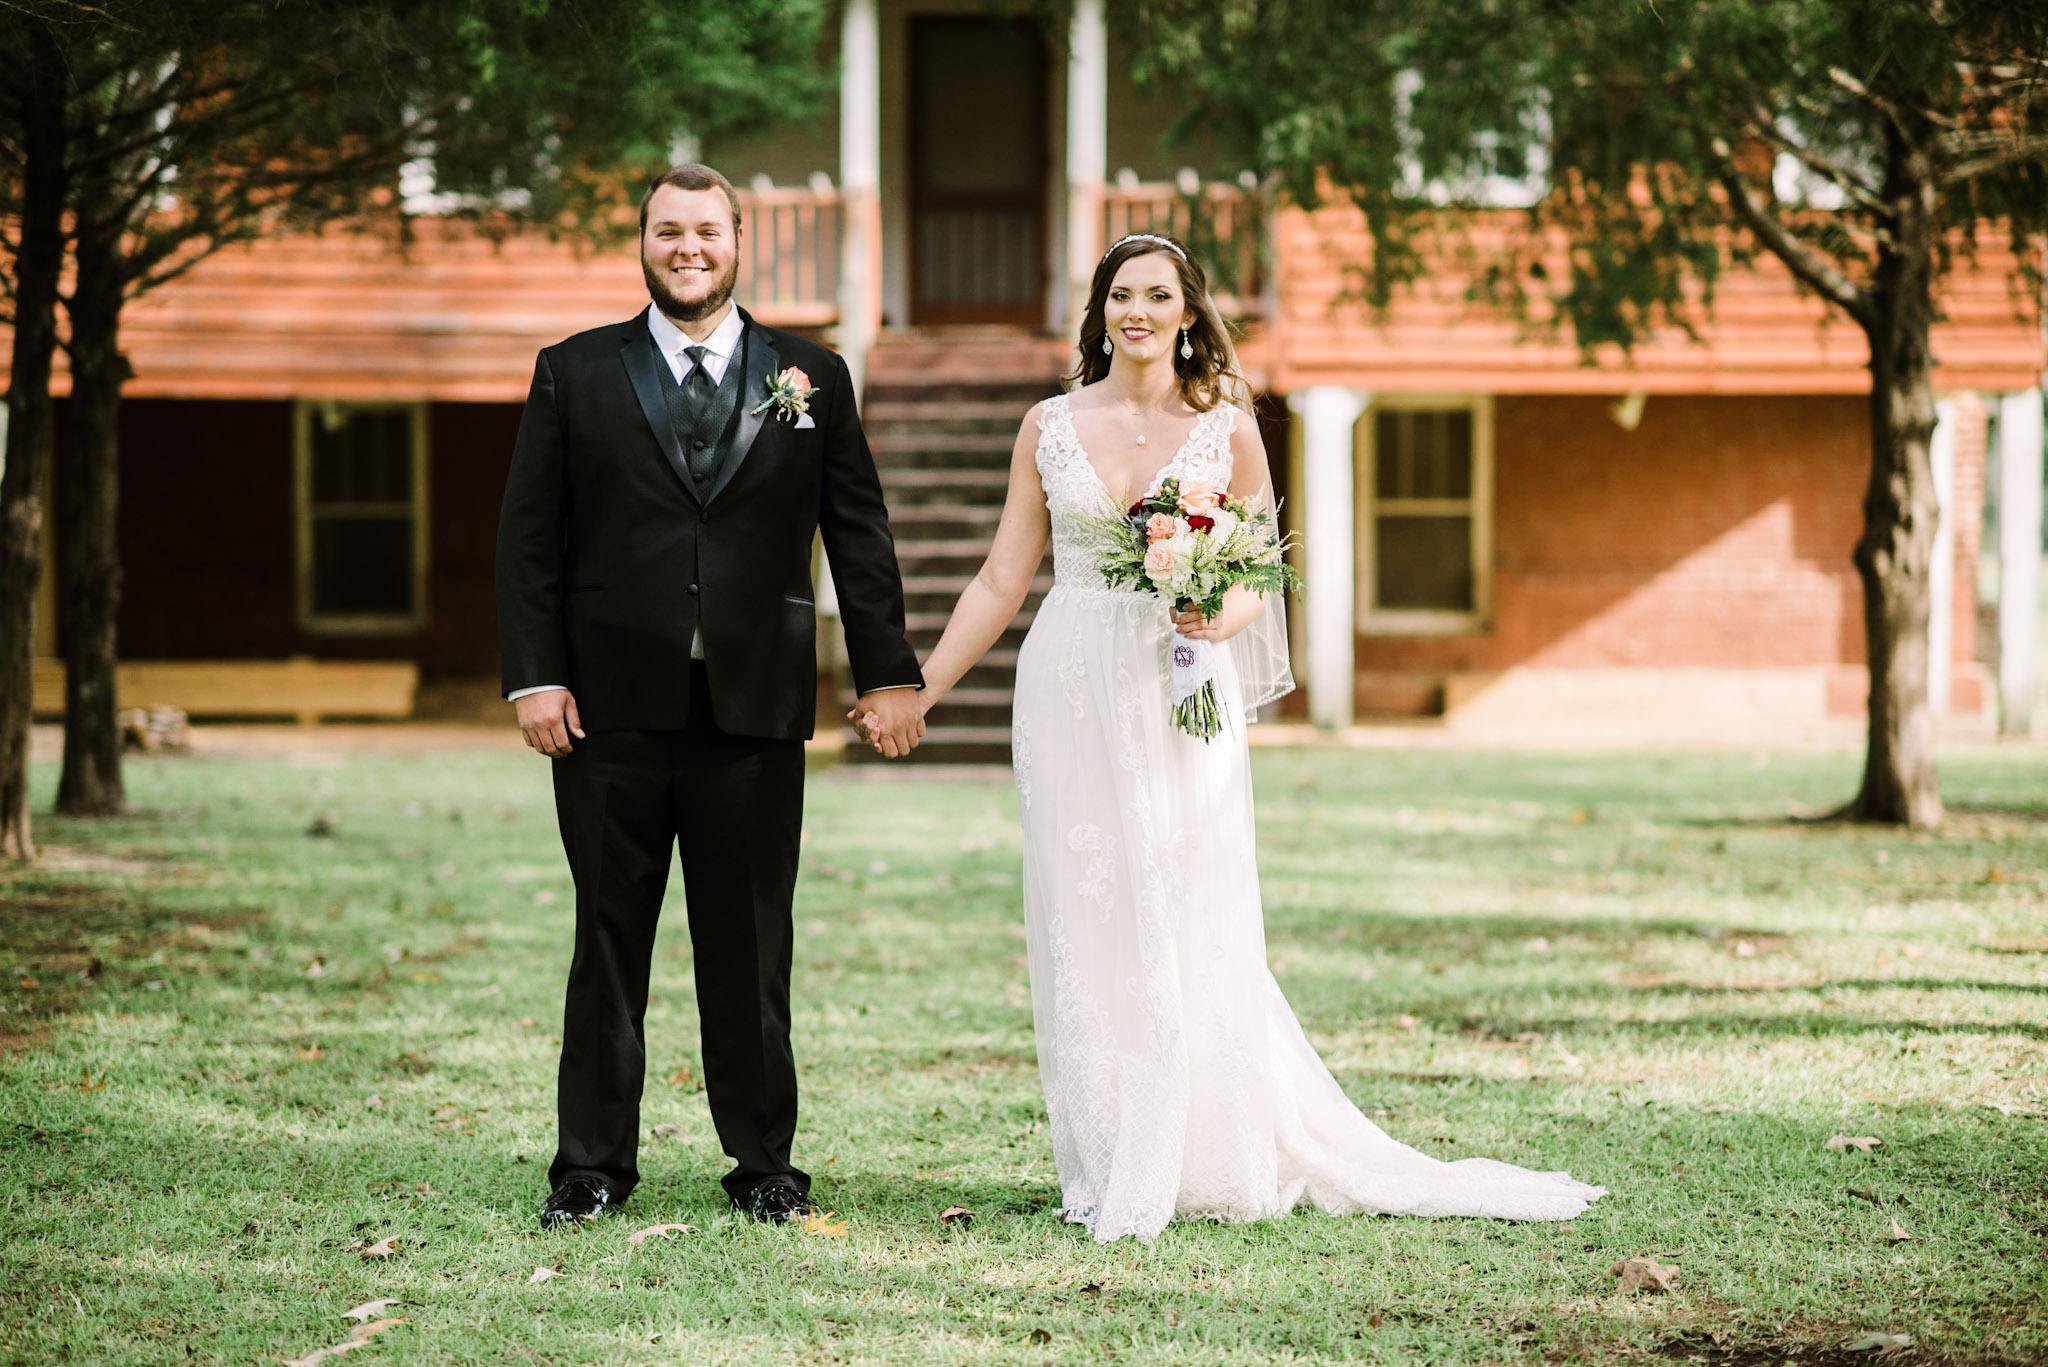 Jas_Natalie_Foxworth_Wedding_2018-2.jpg